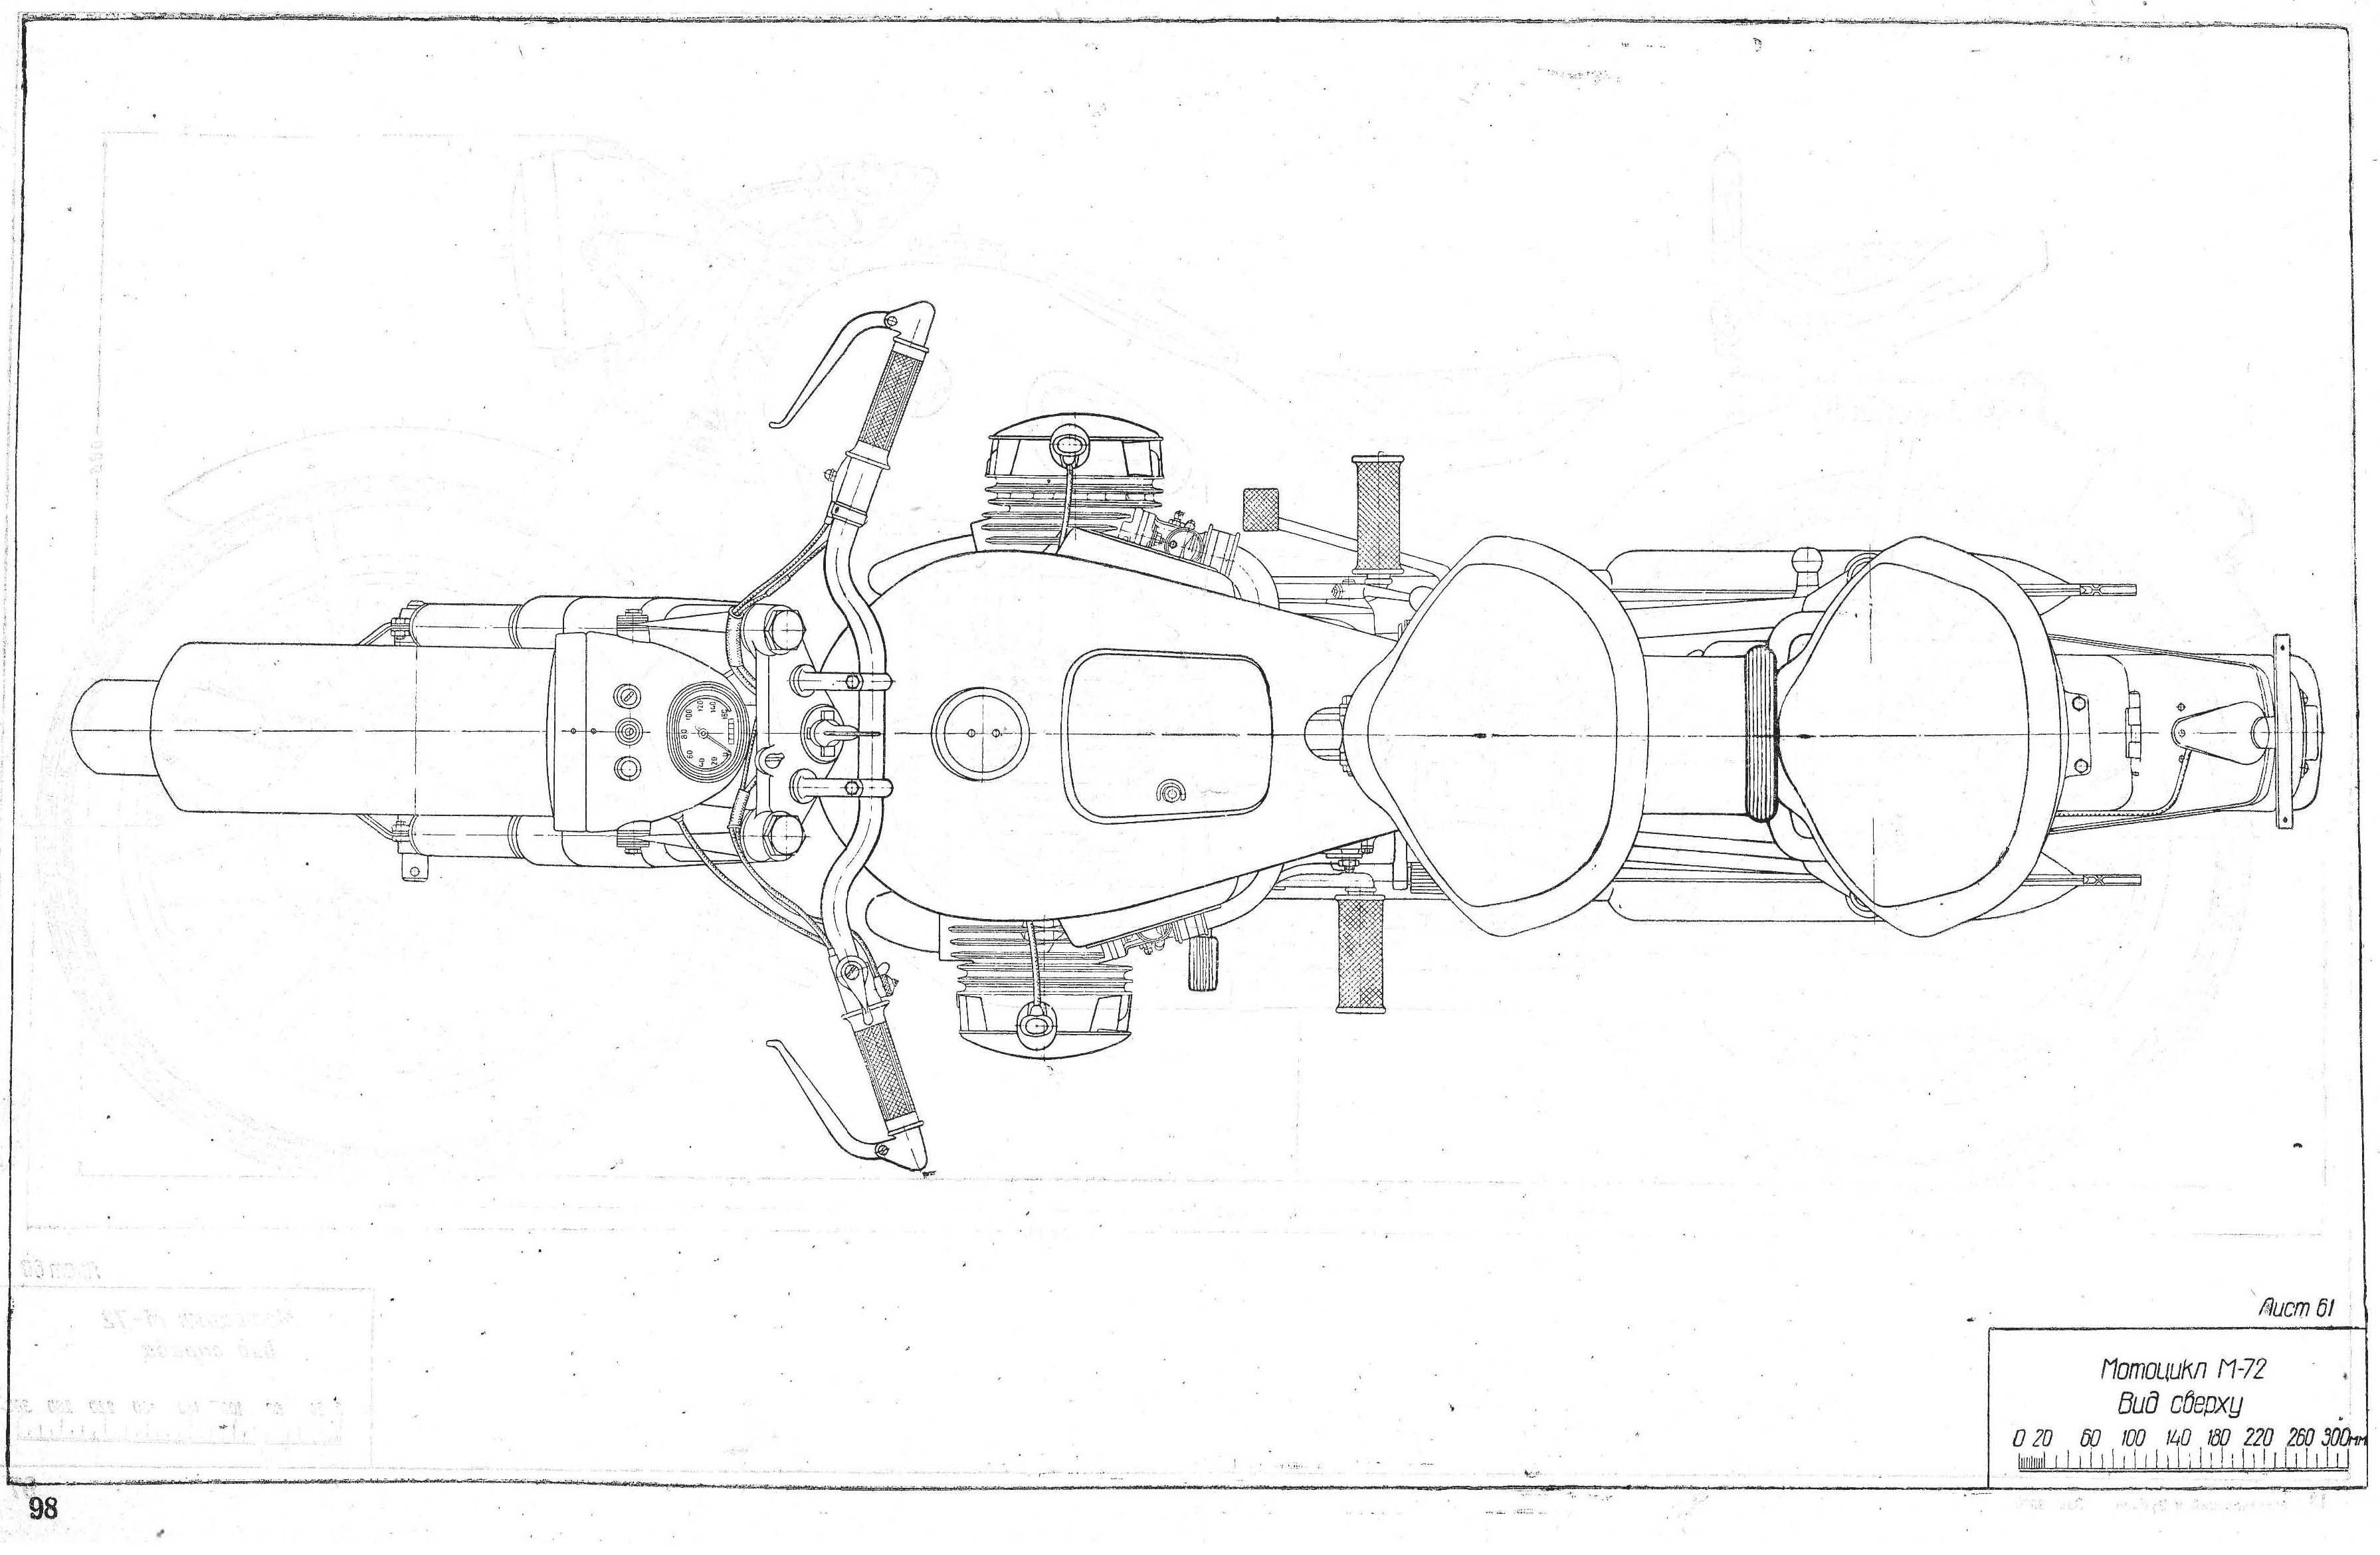 Dnepr M-72 blueprint